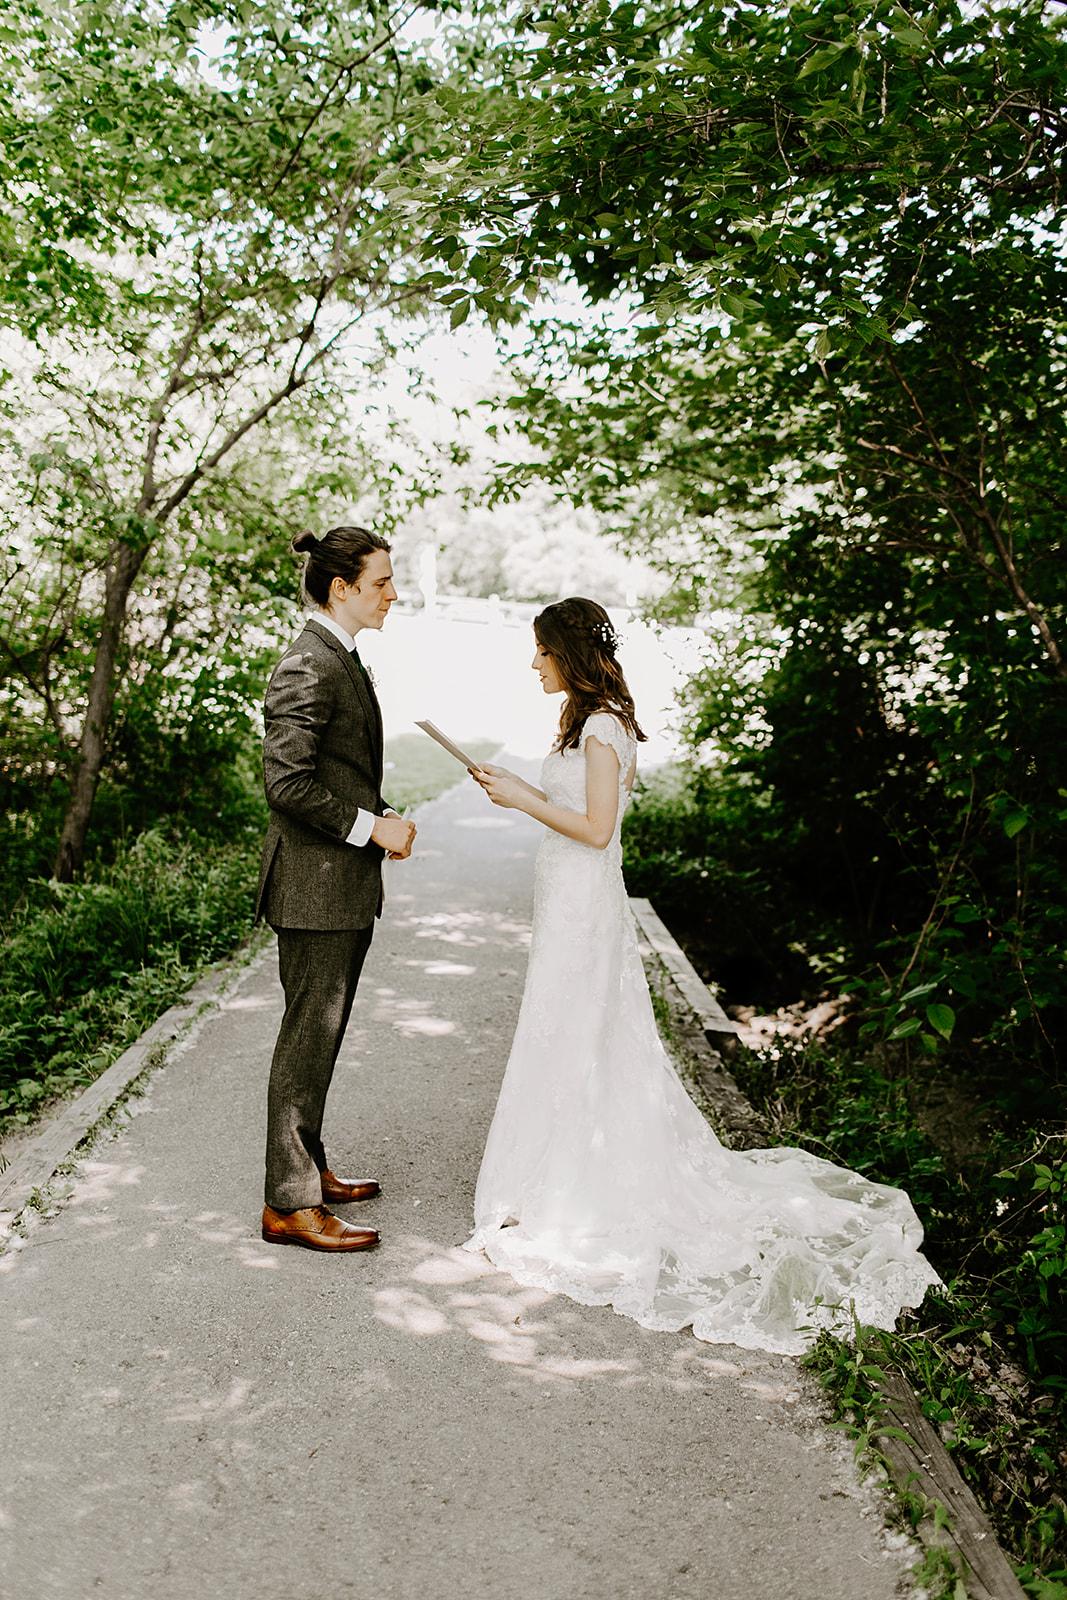 Lily and Easton Wedding Carmel Indiana Cool Creek Park Grace Church Emily Elyse Wehner Photography -120.jpg